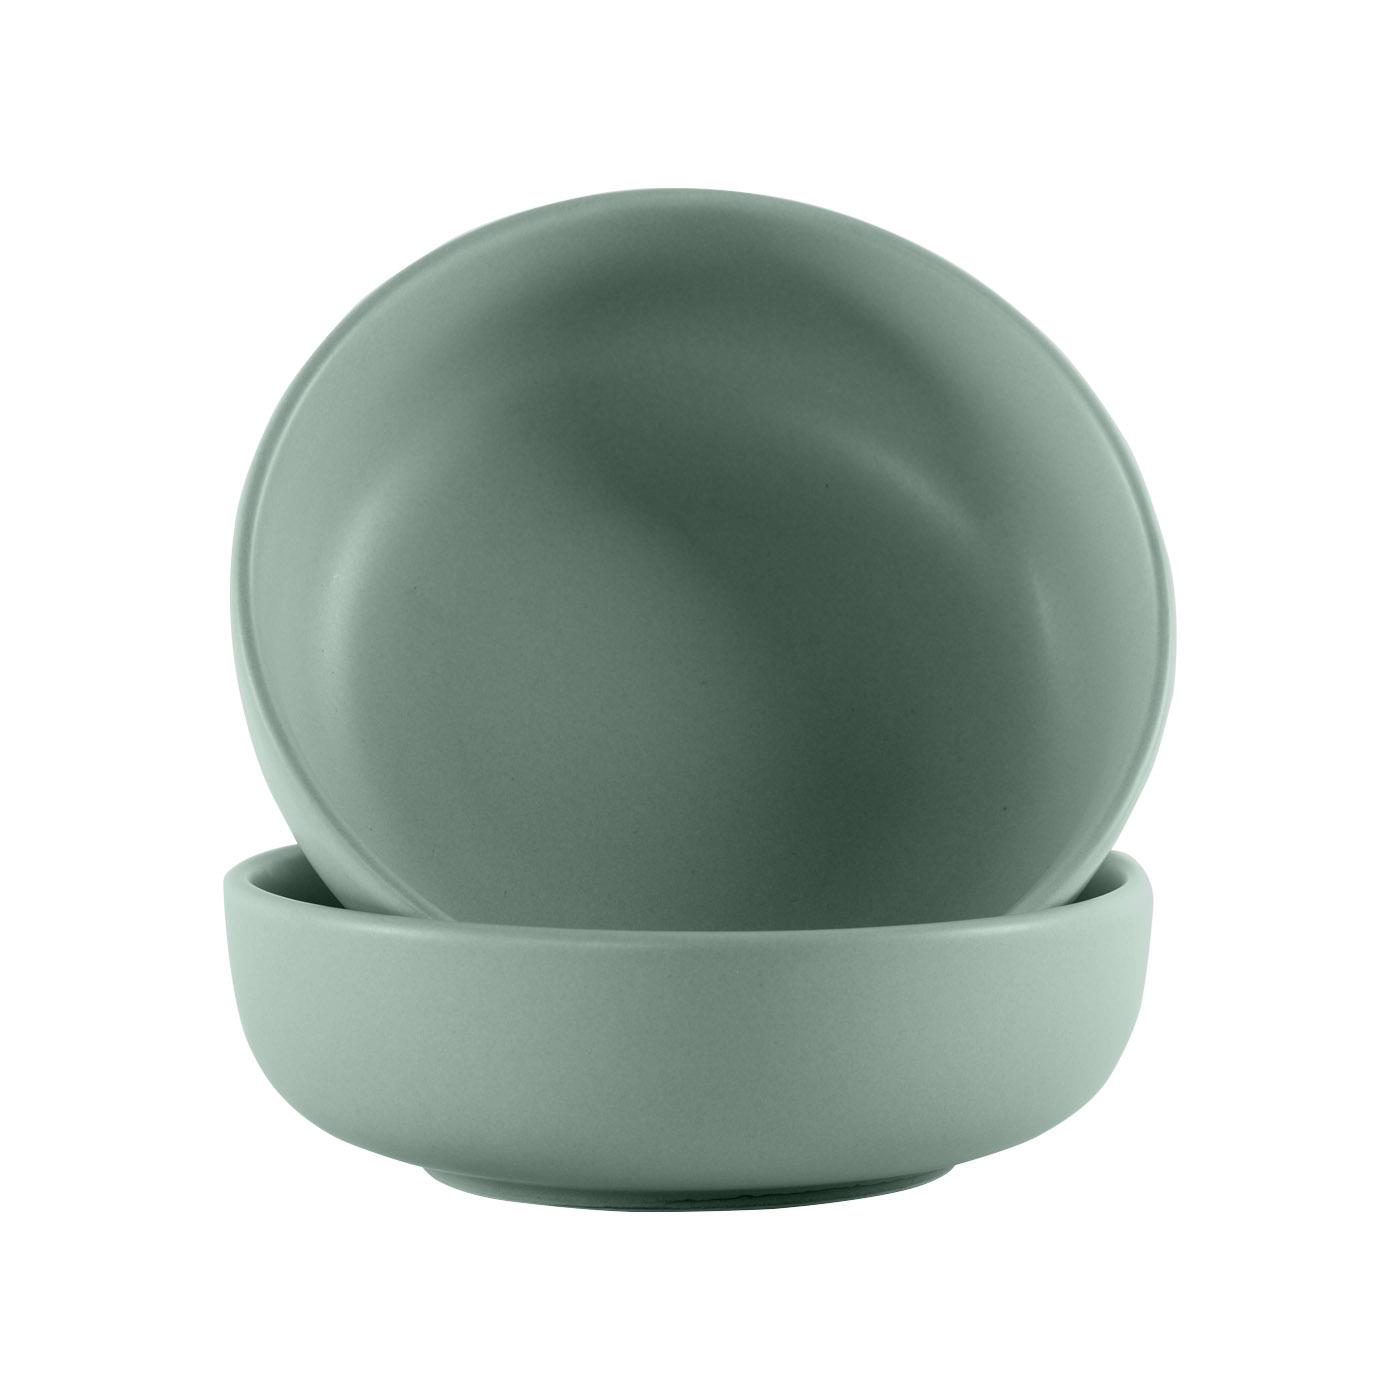 Green Ceramic Large Bowls